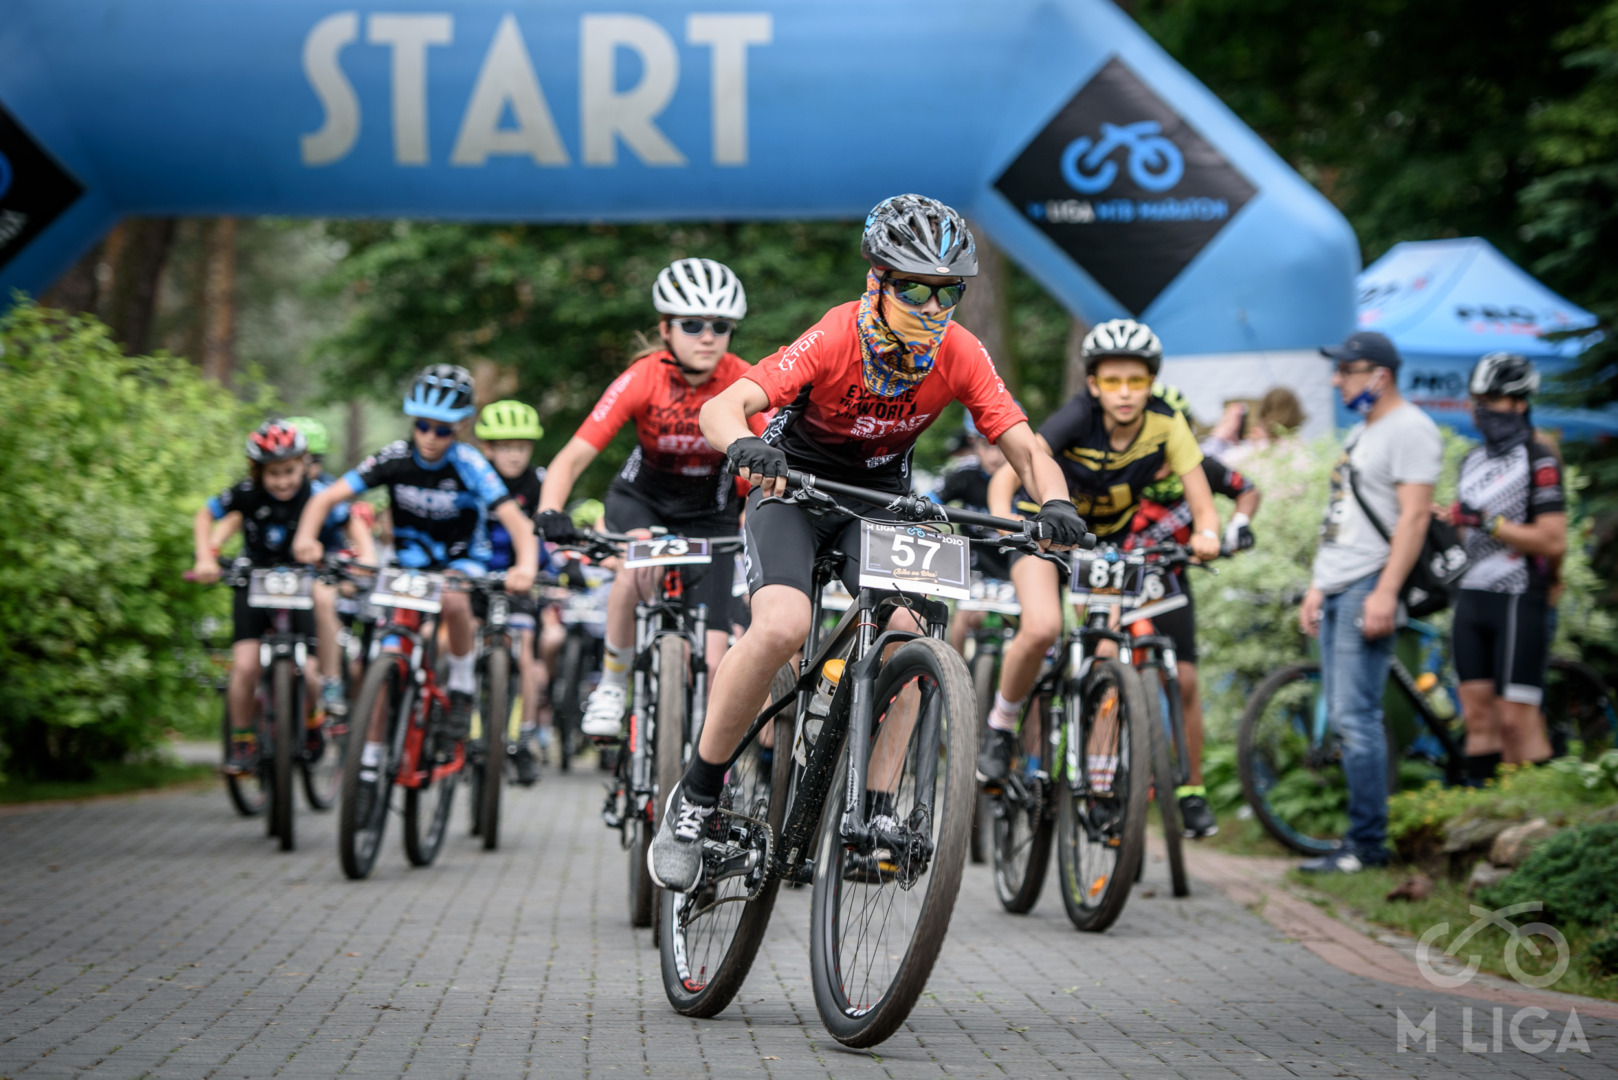 Inauguracja cyklu M LIGA MTB Maraton – Wawer